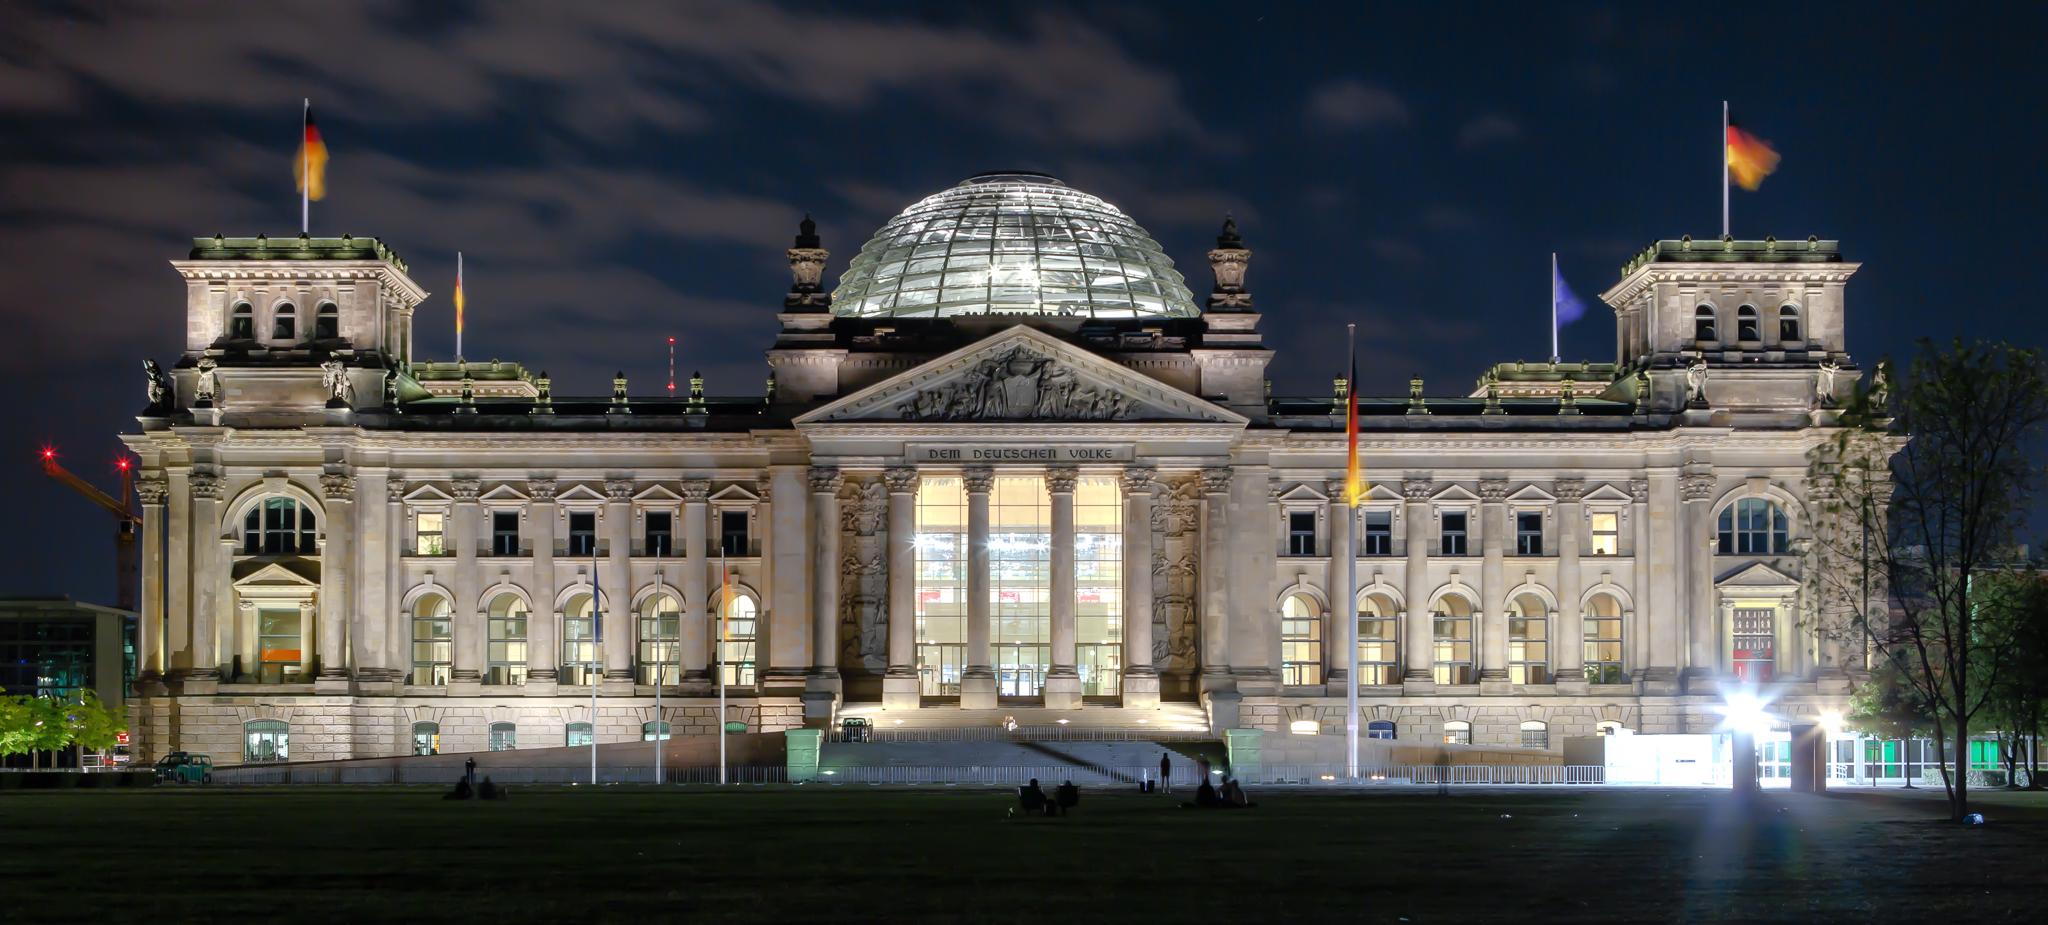 berlin_reichstag_building_at_night_2013.jpg